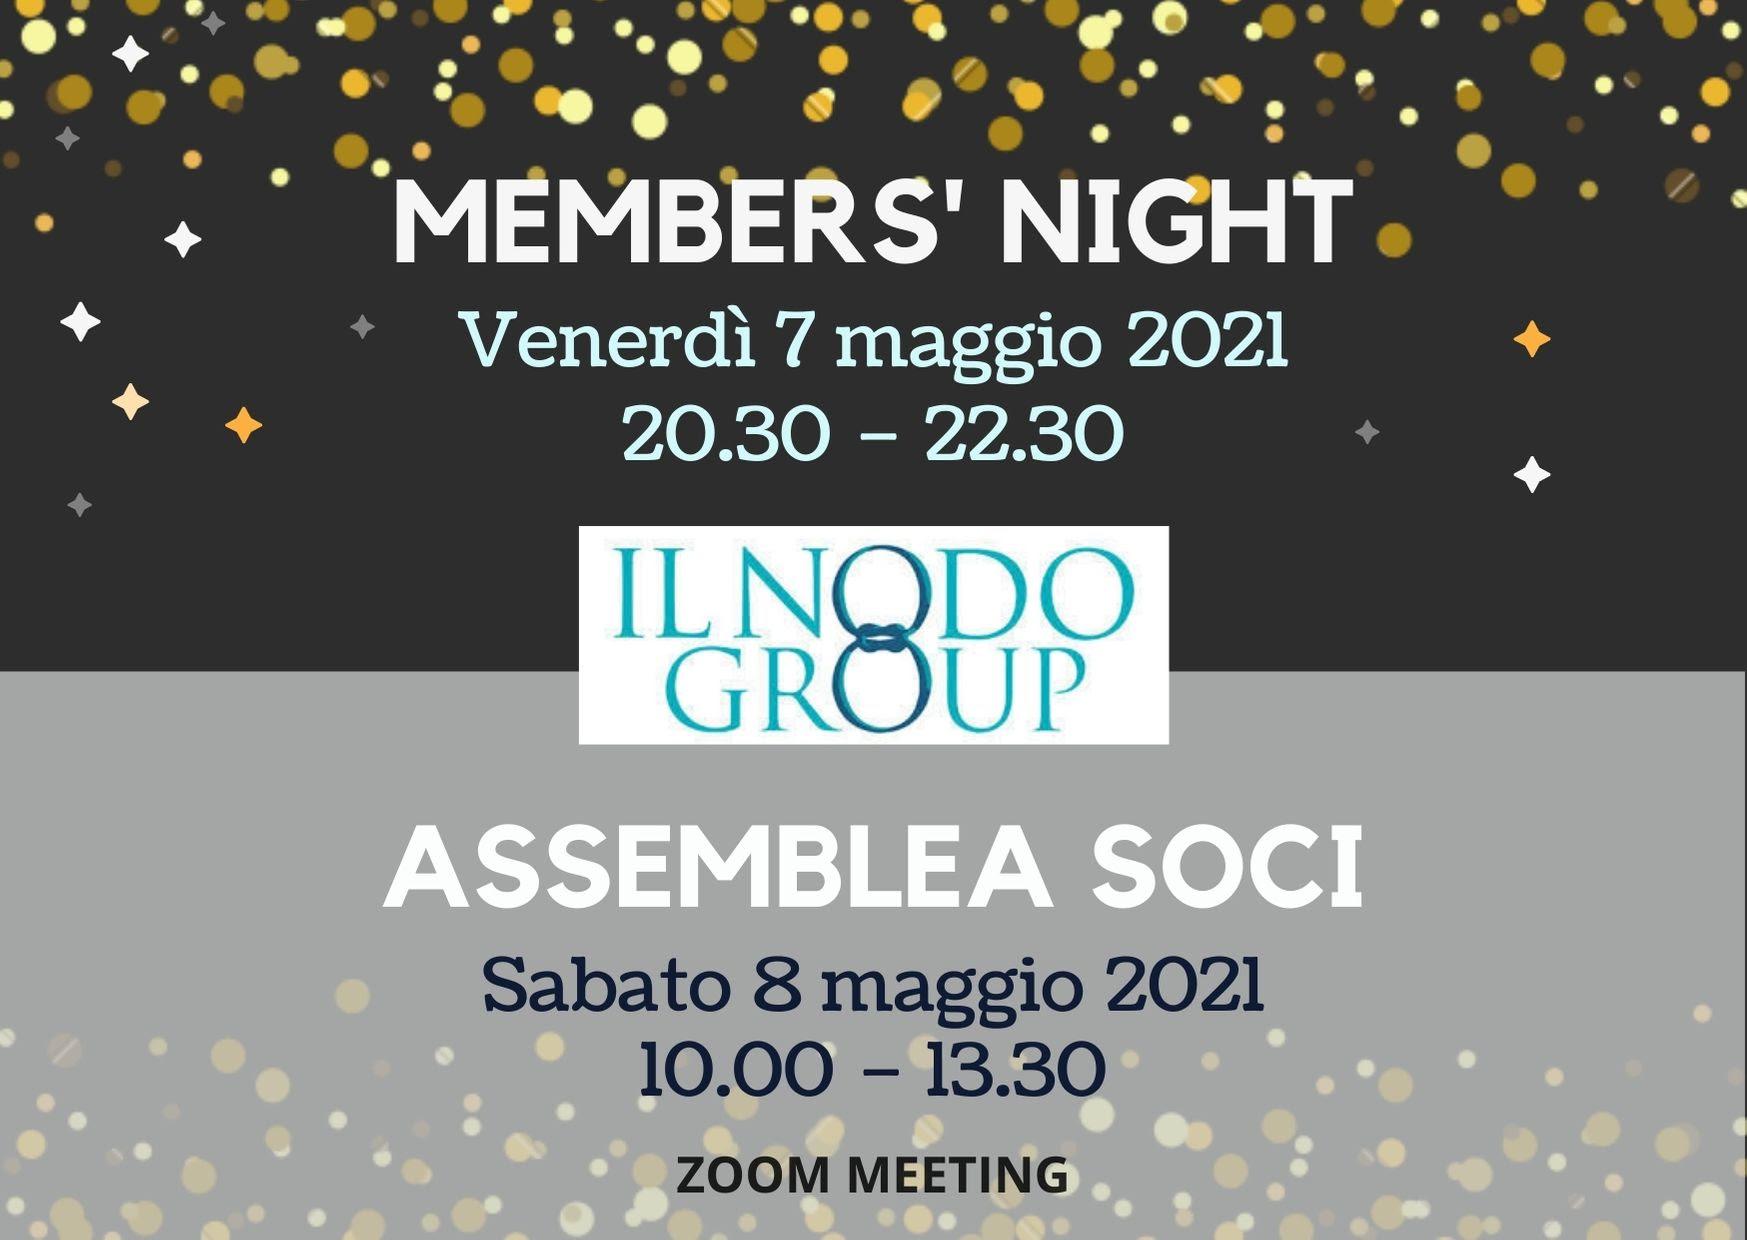 Members' night 2021